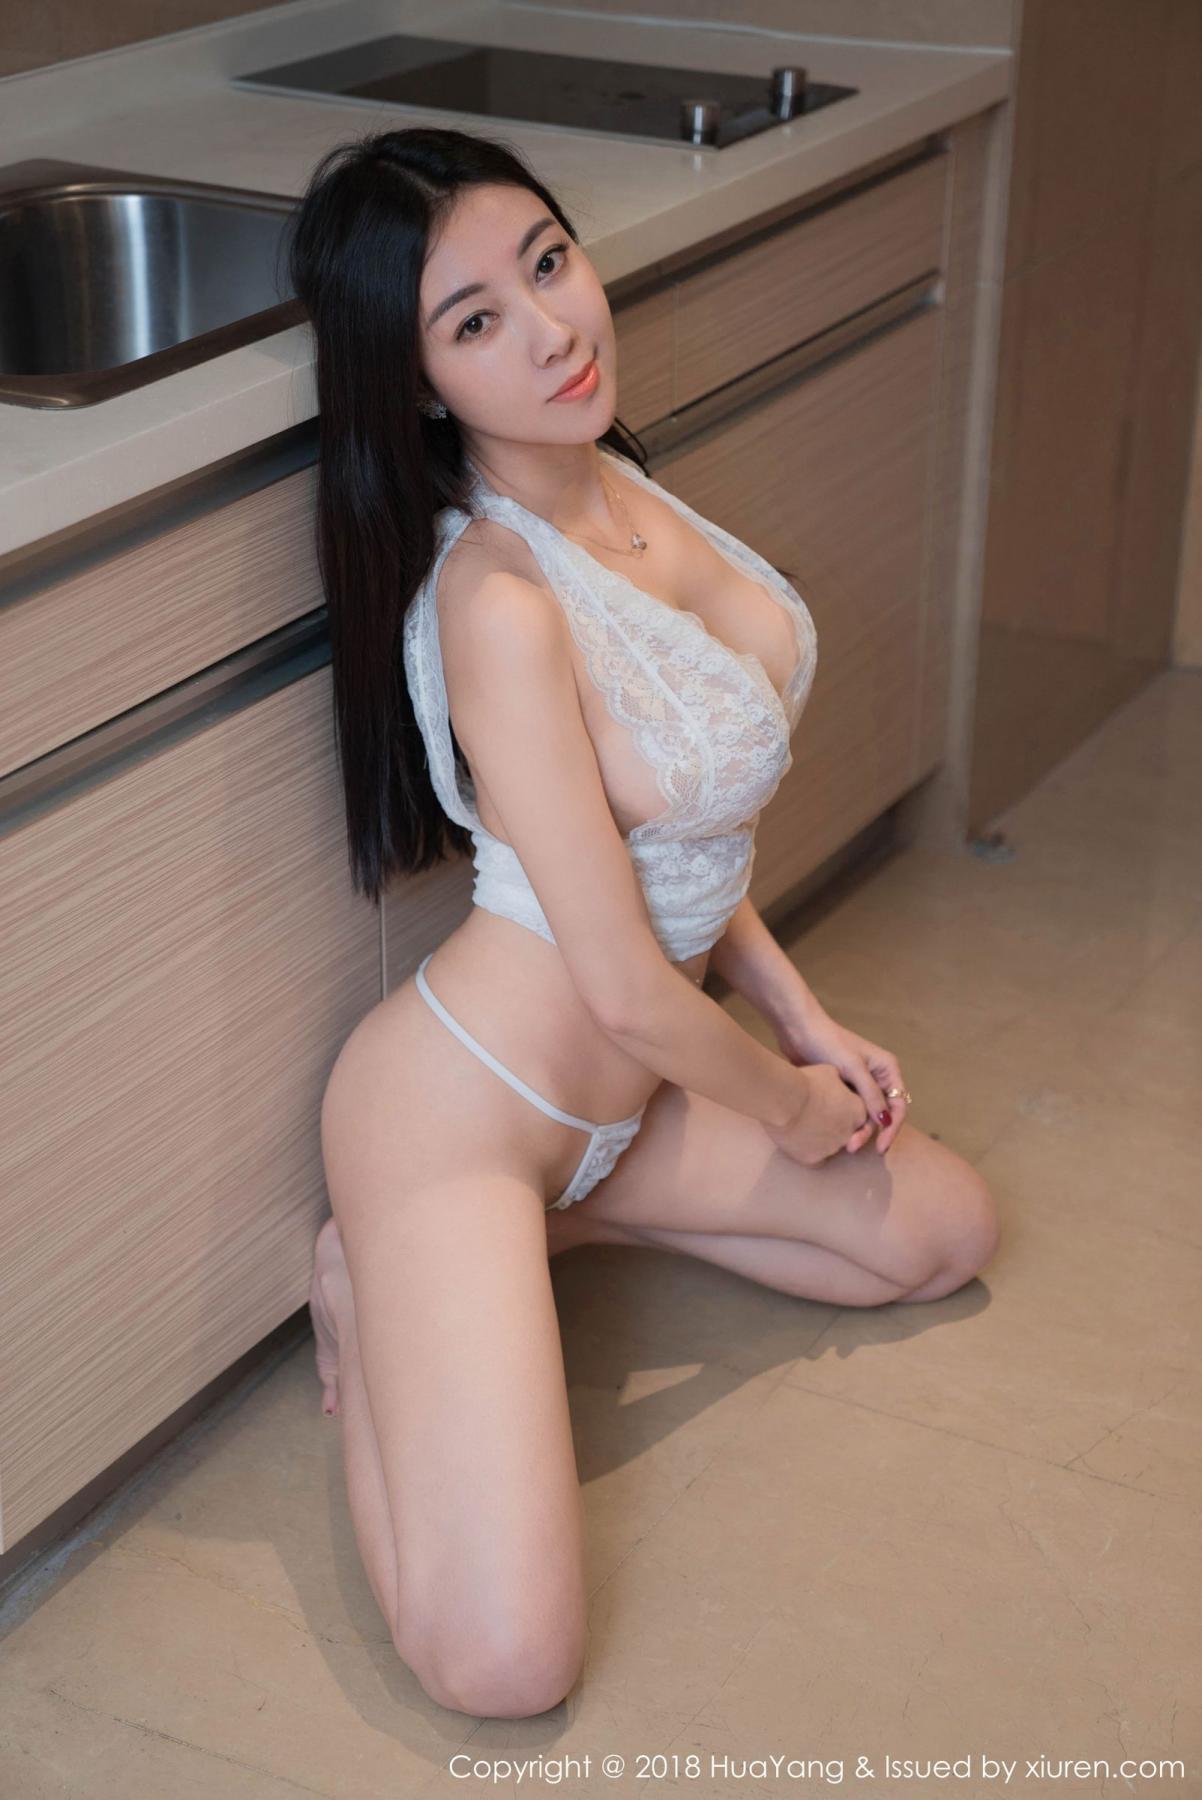 [Huayang] Vol.090 Song Guo Er 42P, HuaYang, Song Guo Er, Underwear